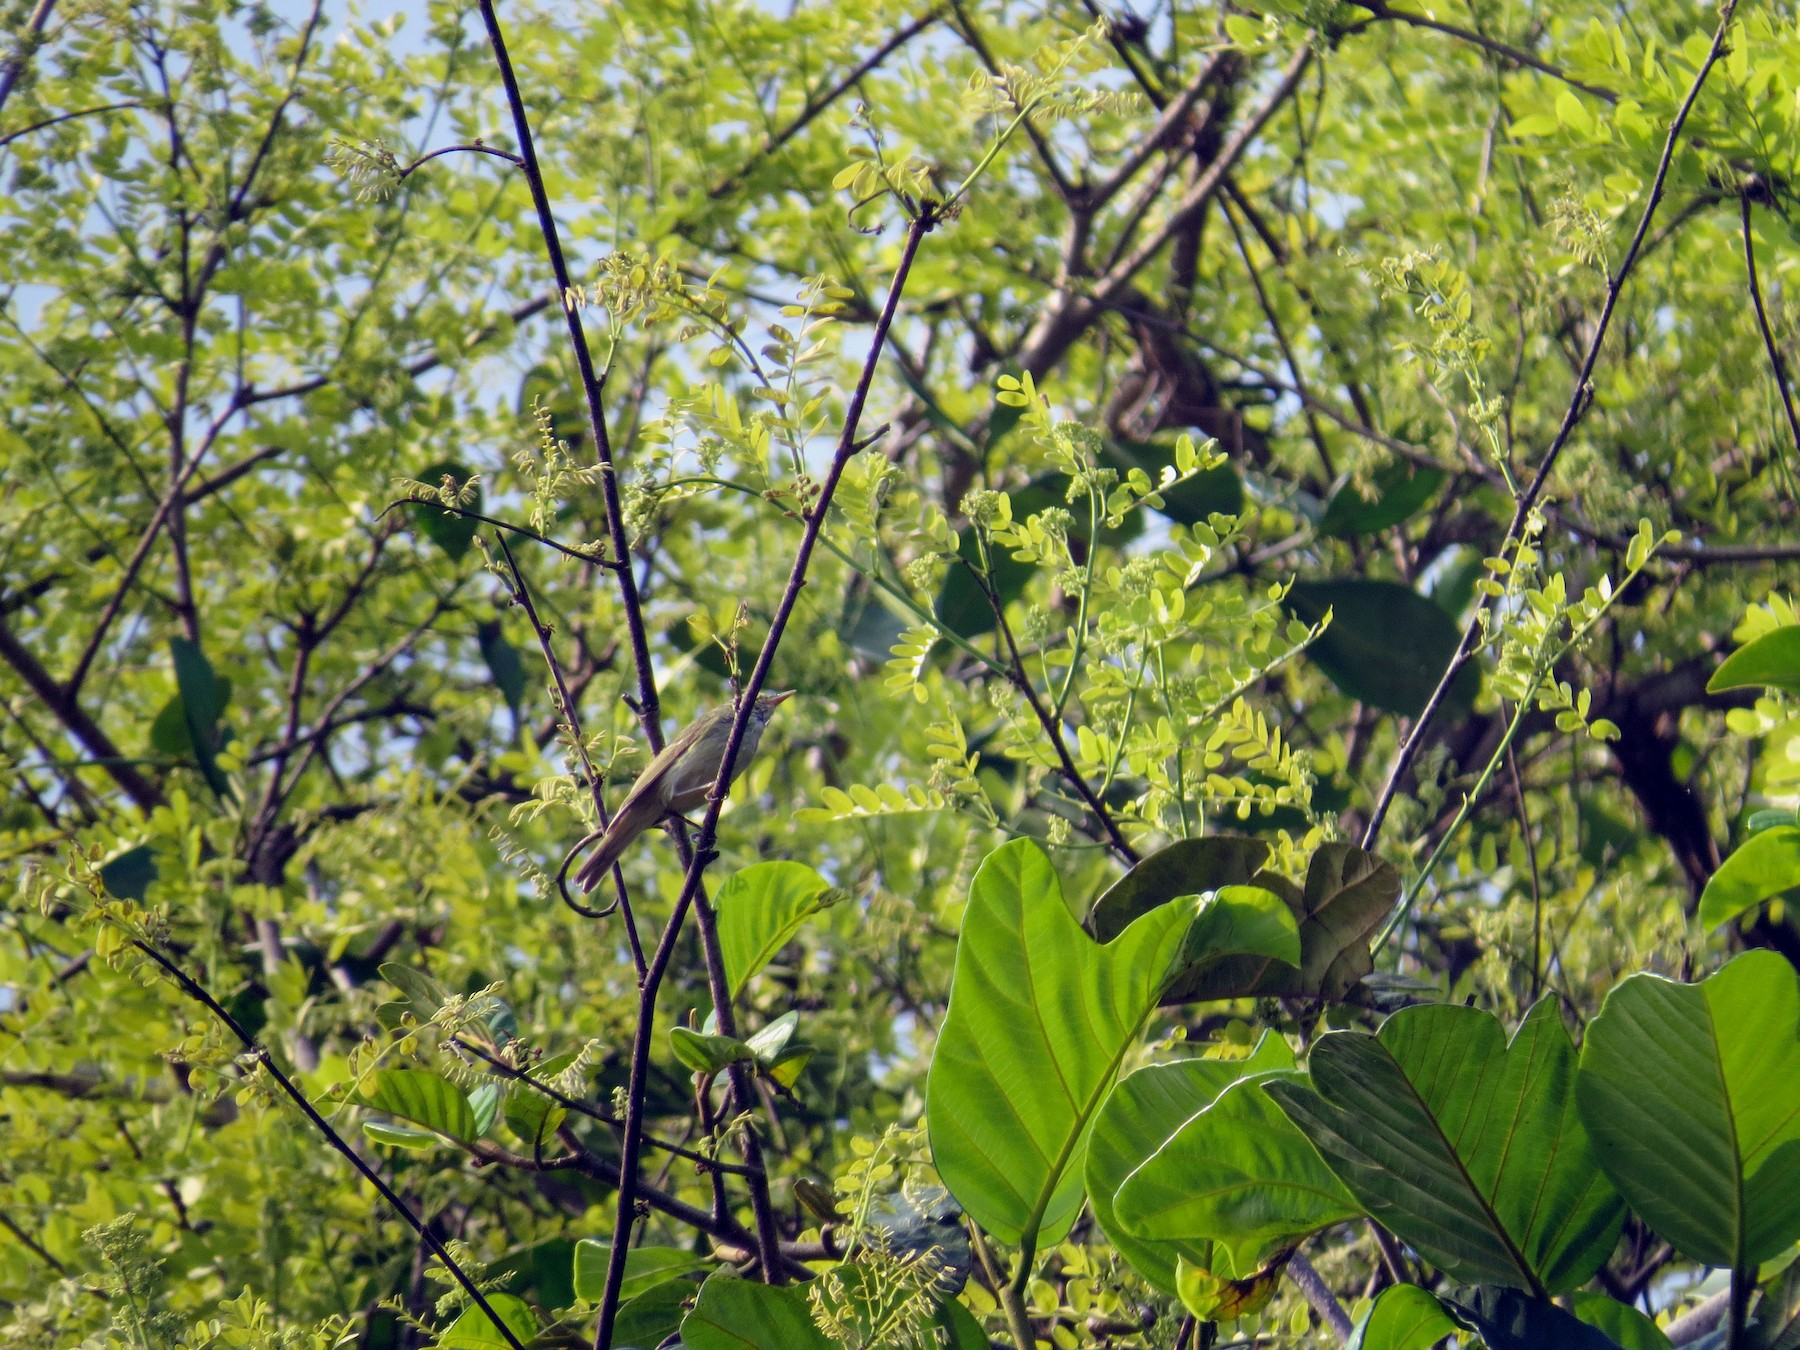 Green Warbler - Ashwin R